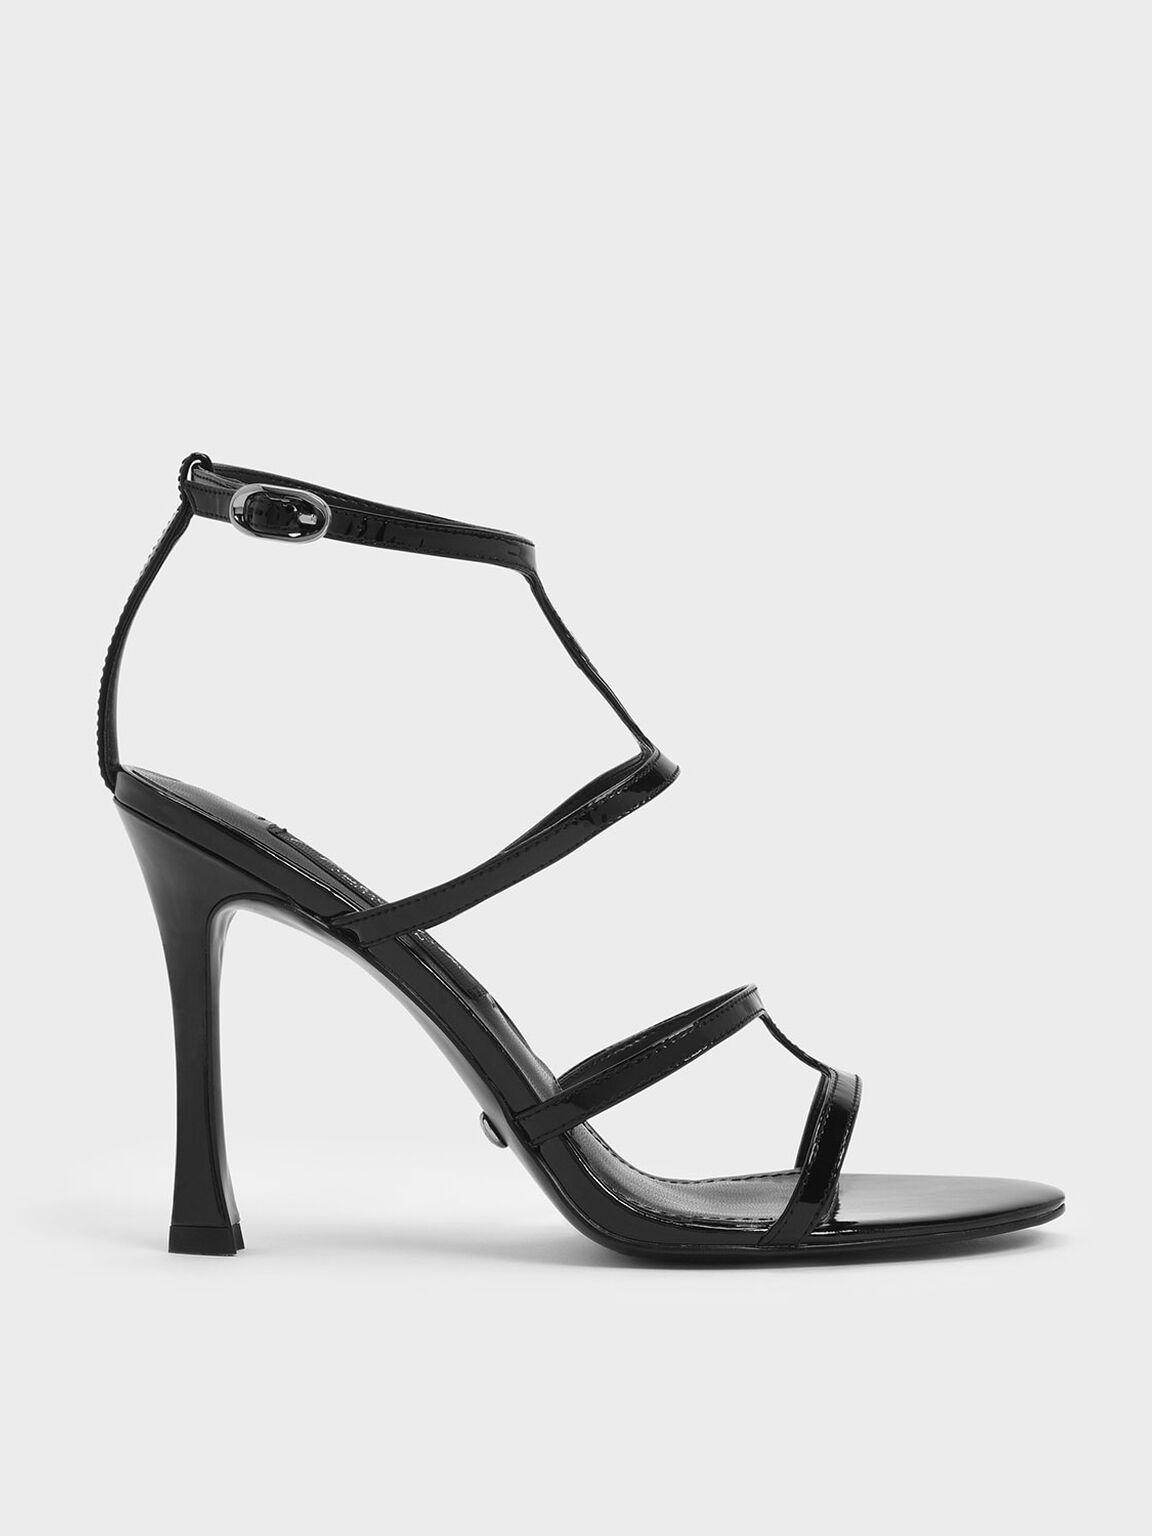 Patent Leather Strappy Stiletto Heel Sandals, Black, hi-res